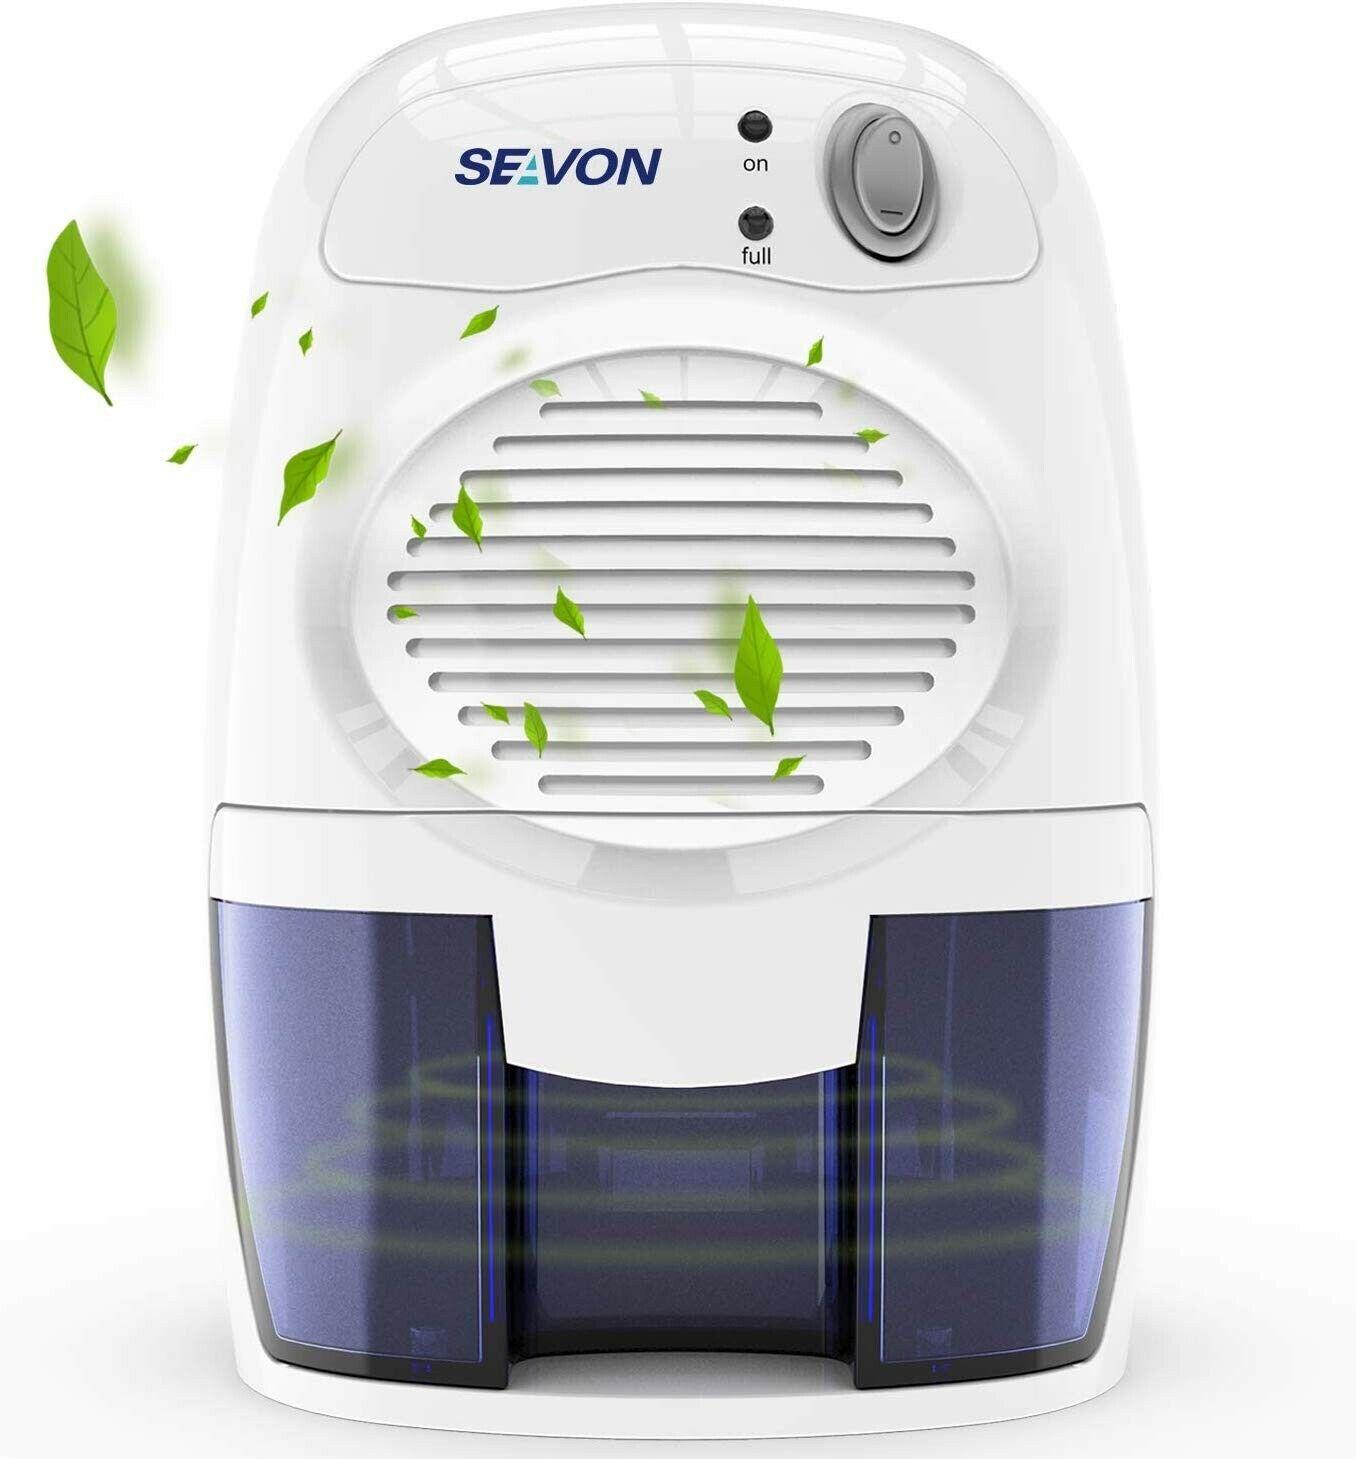 SEAVON New Electric 2020 Mini Dehumidifier, 1500 Cubic Feet